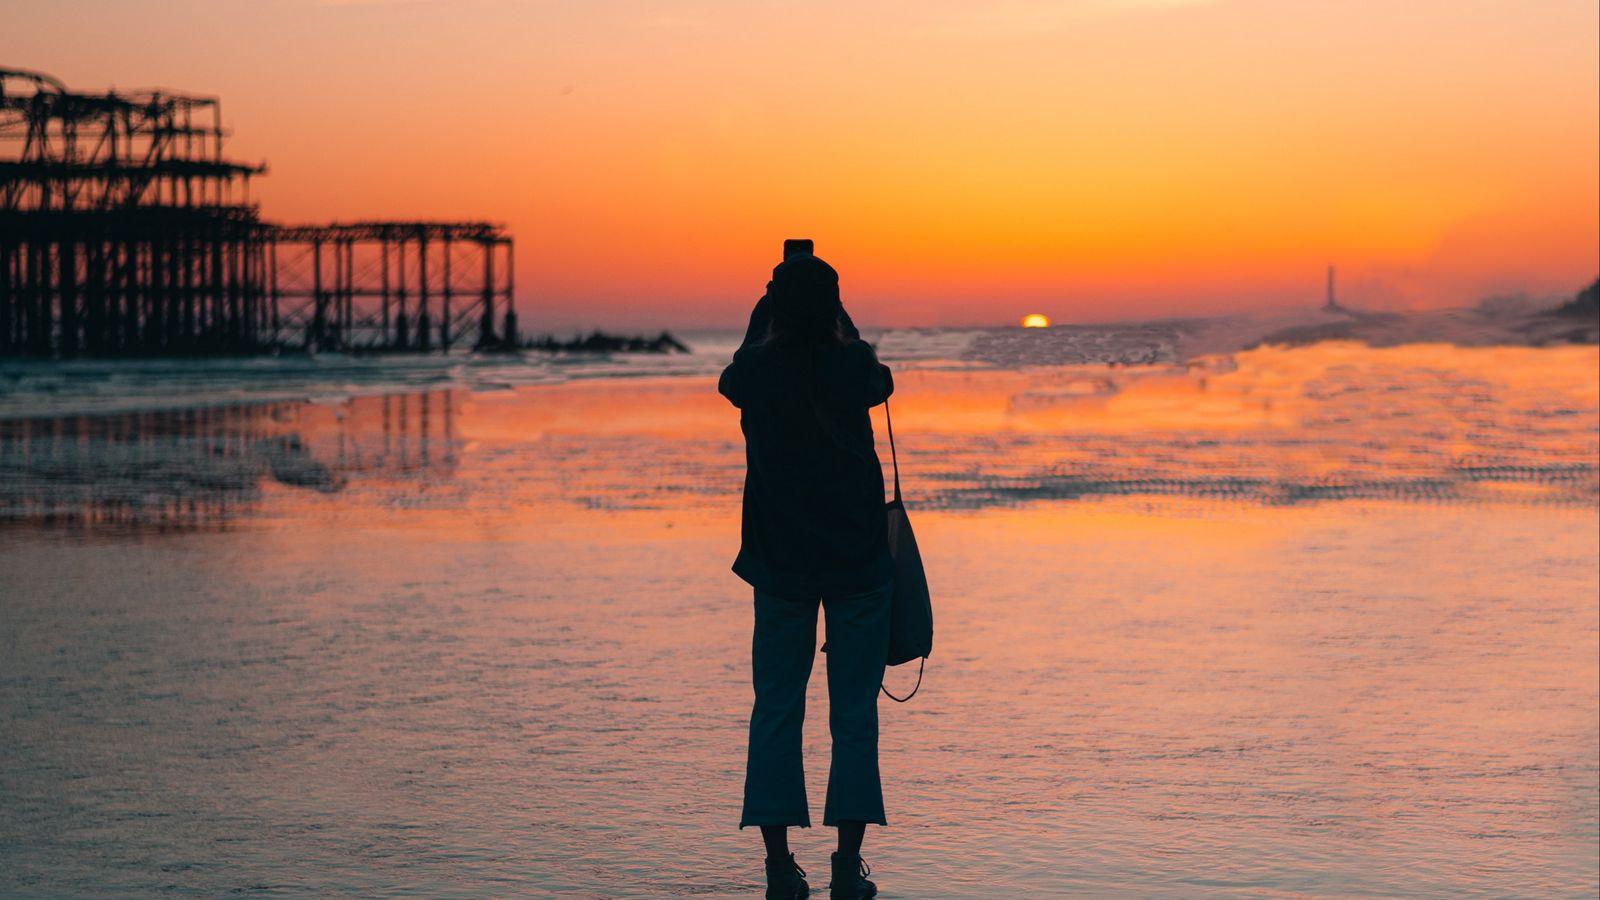 1600x900 Wallpaper silhouette, alone, beach, sea, sunset, dark